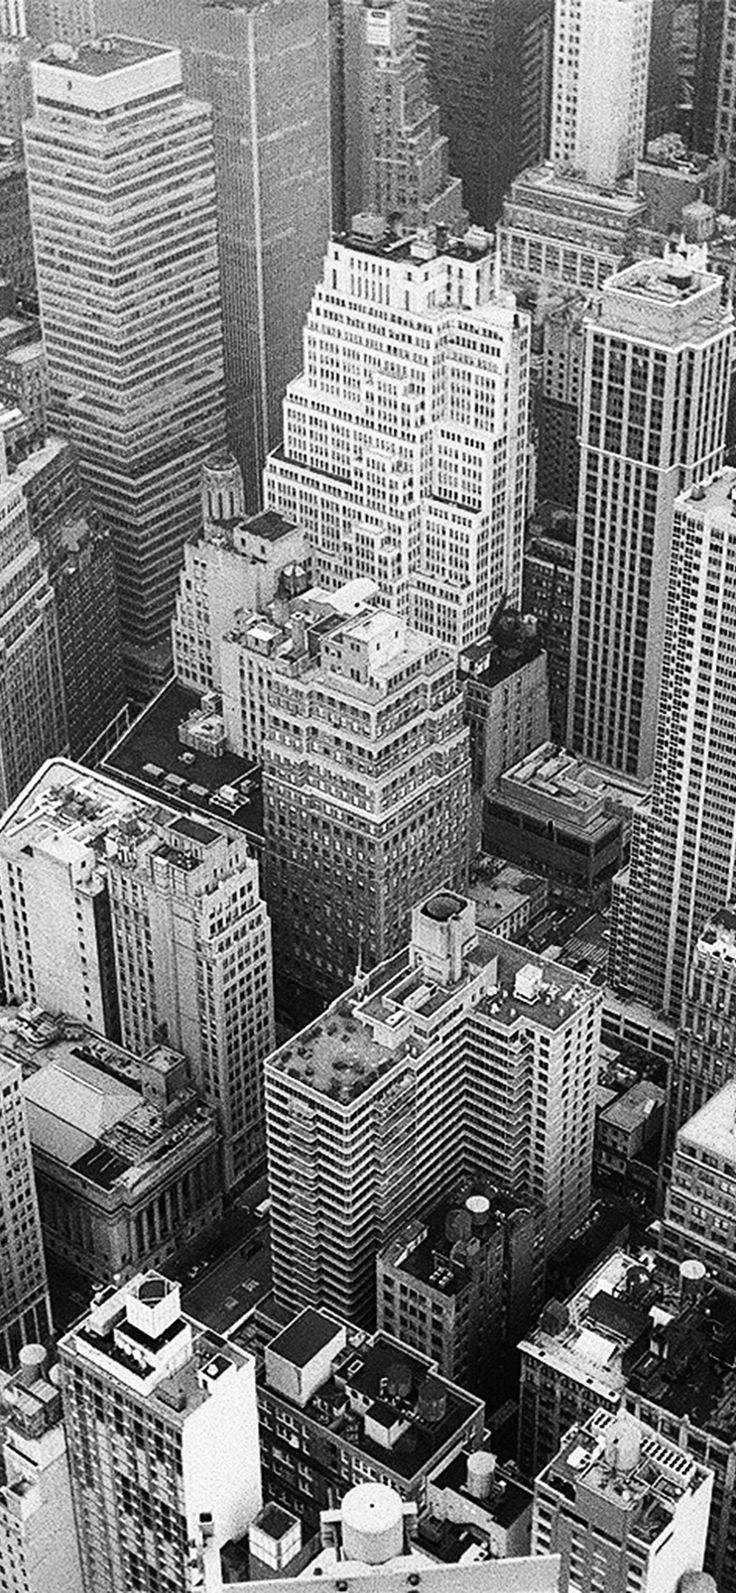 Iphone X Wallpaper Nz07 City Bw Dark Architecture Nature Via